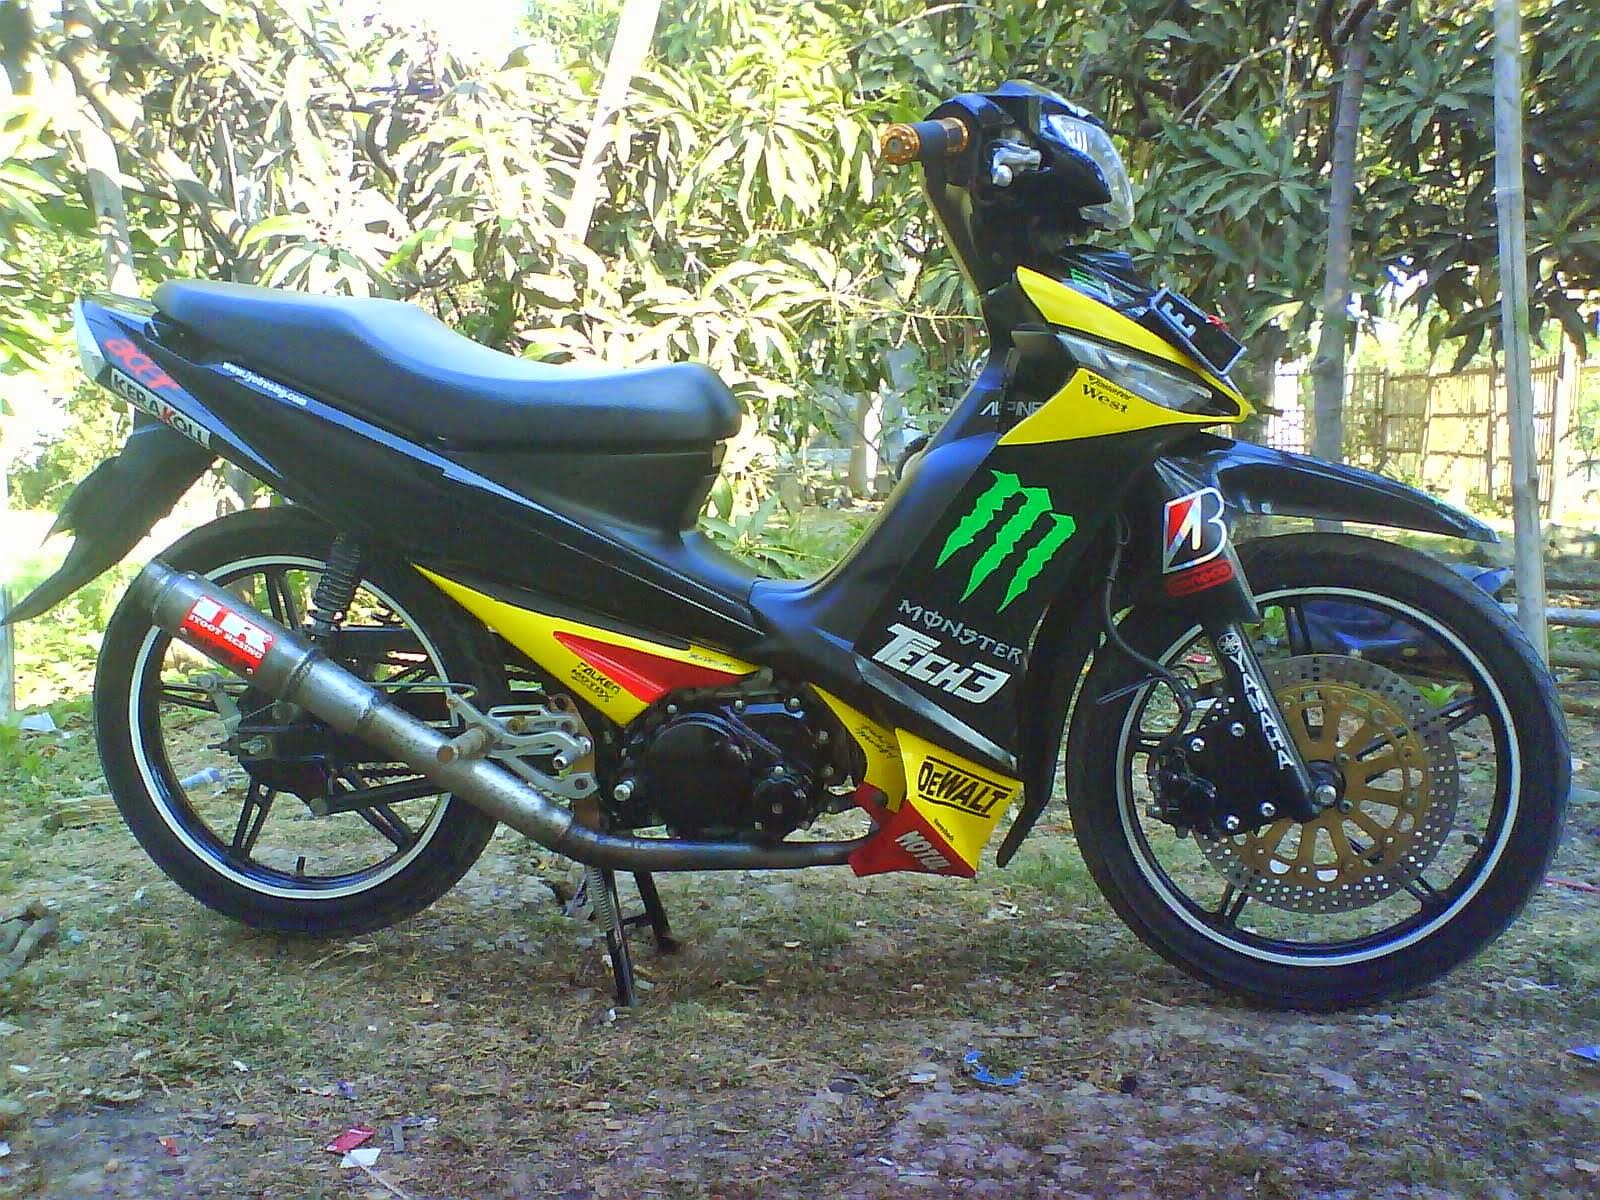 Modif Motor Yamaha Vega 2004